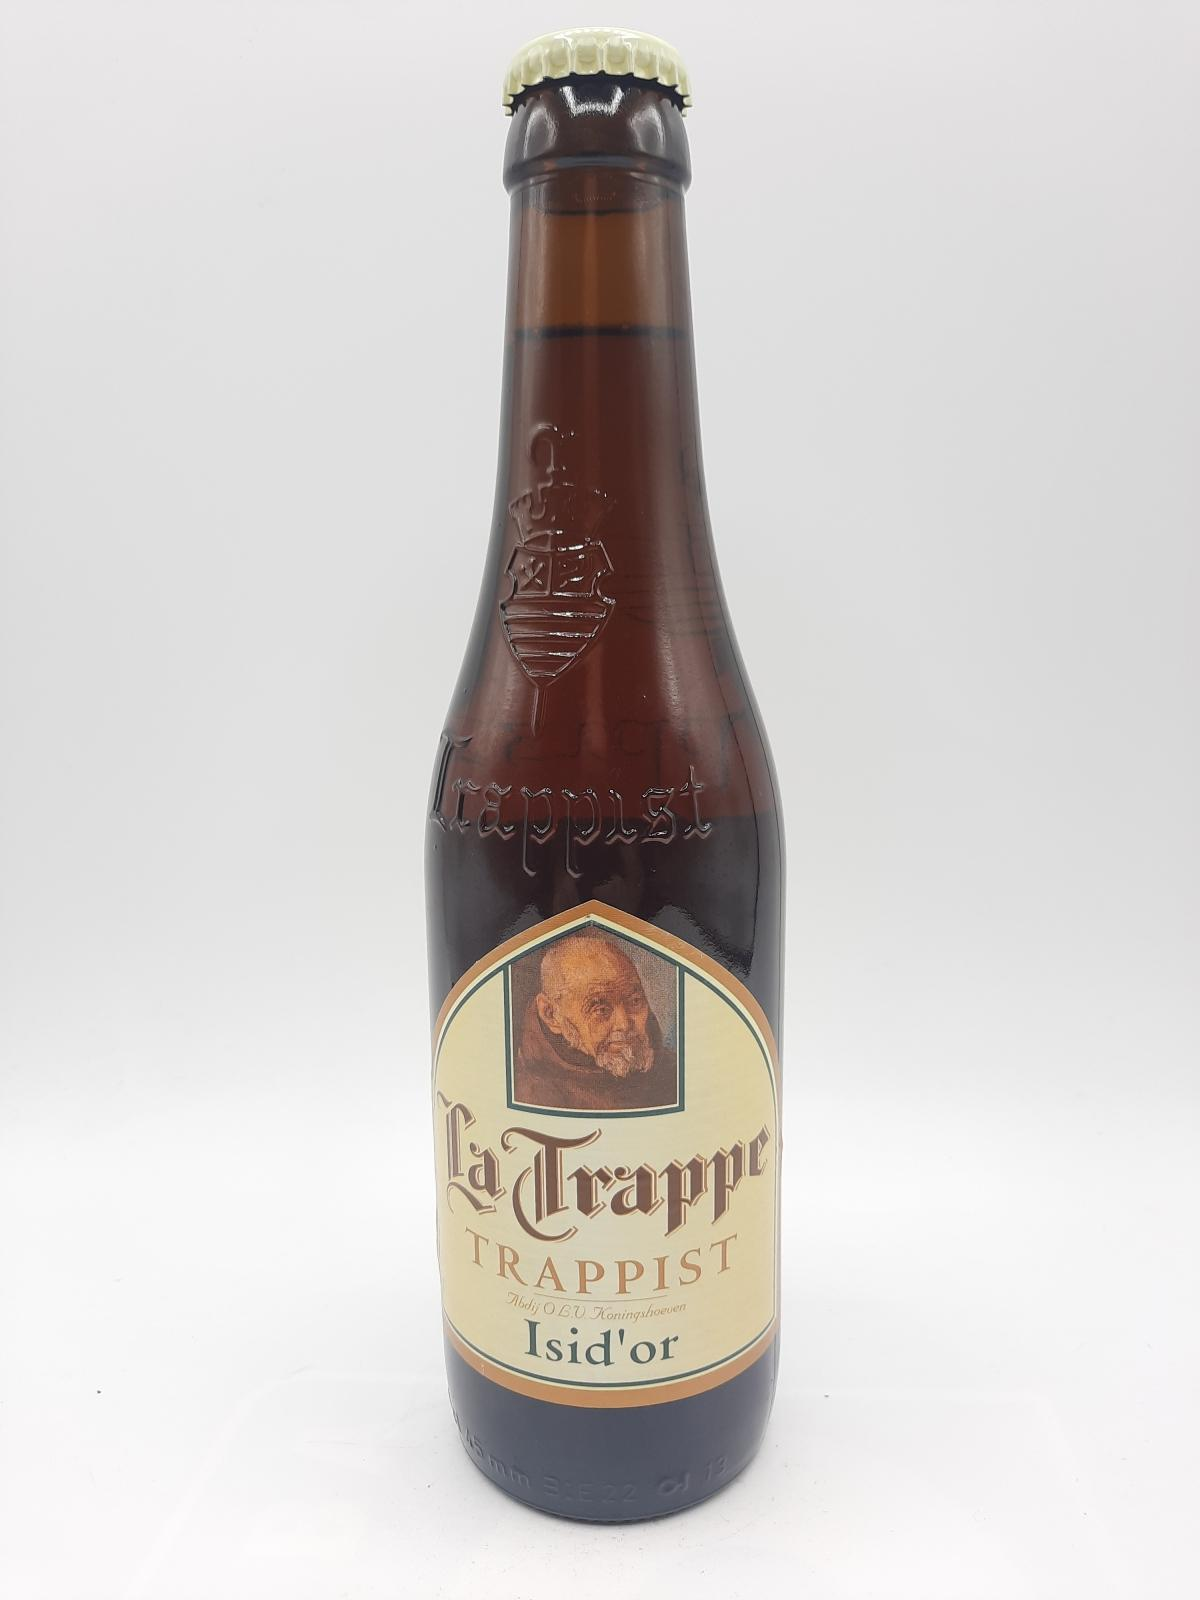 Image La Trappe Isid'or